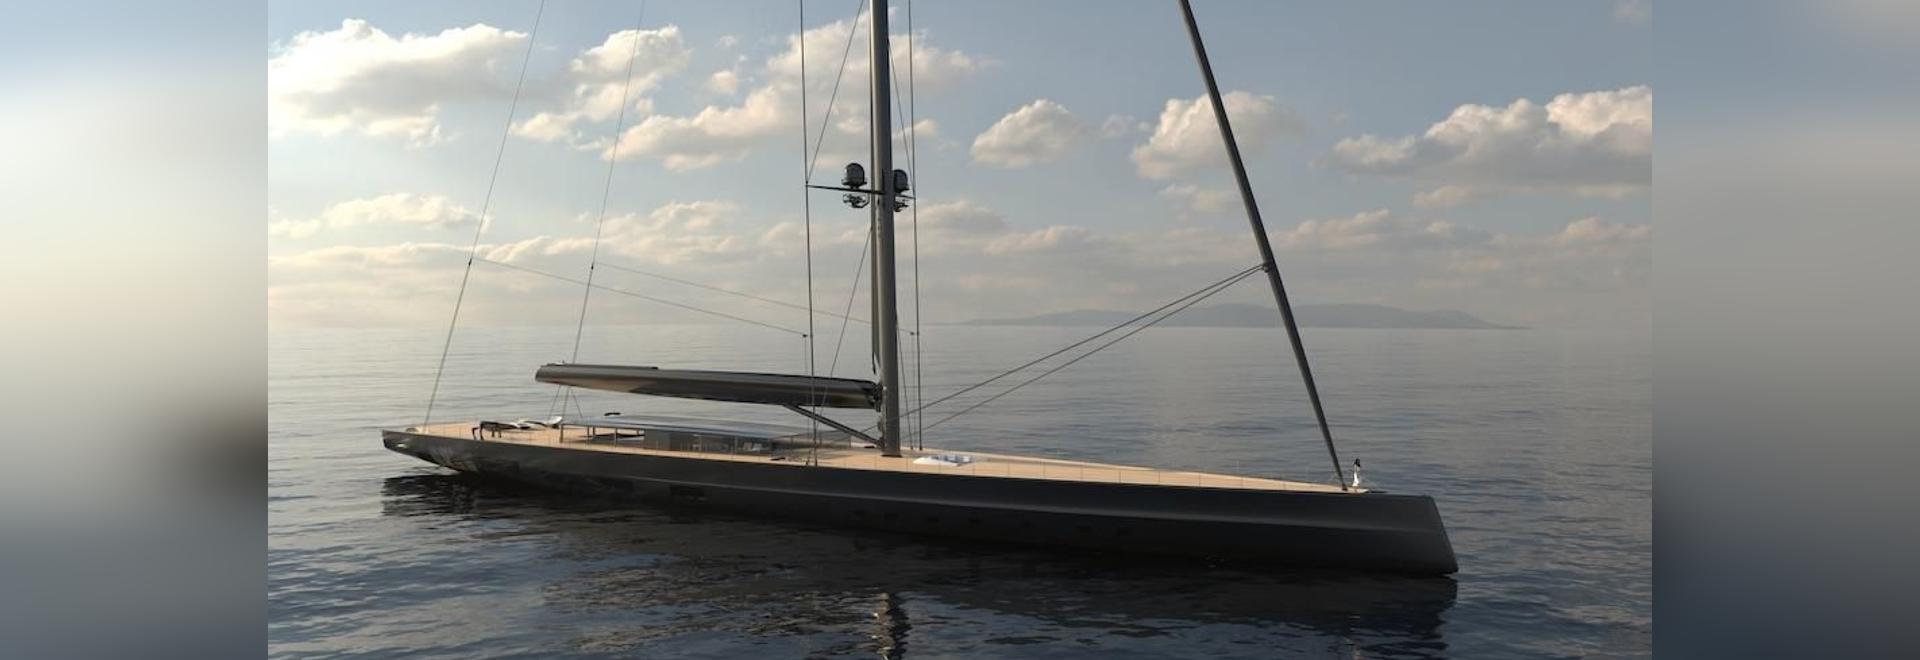 Apex 850: Il nuovo super sloop McKeon 85m di Royal Huisman